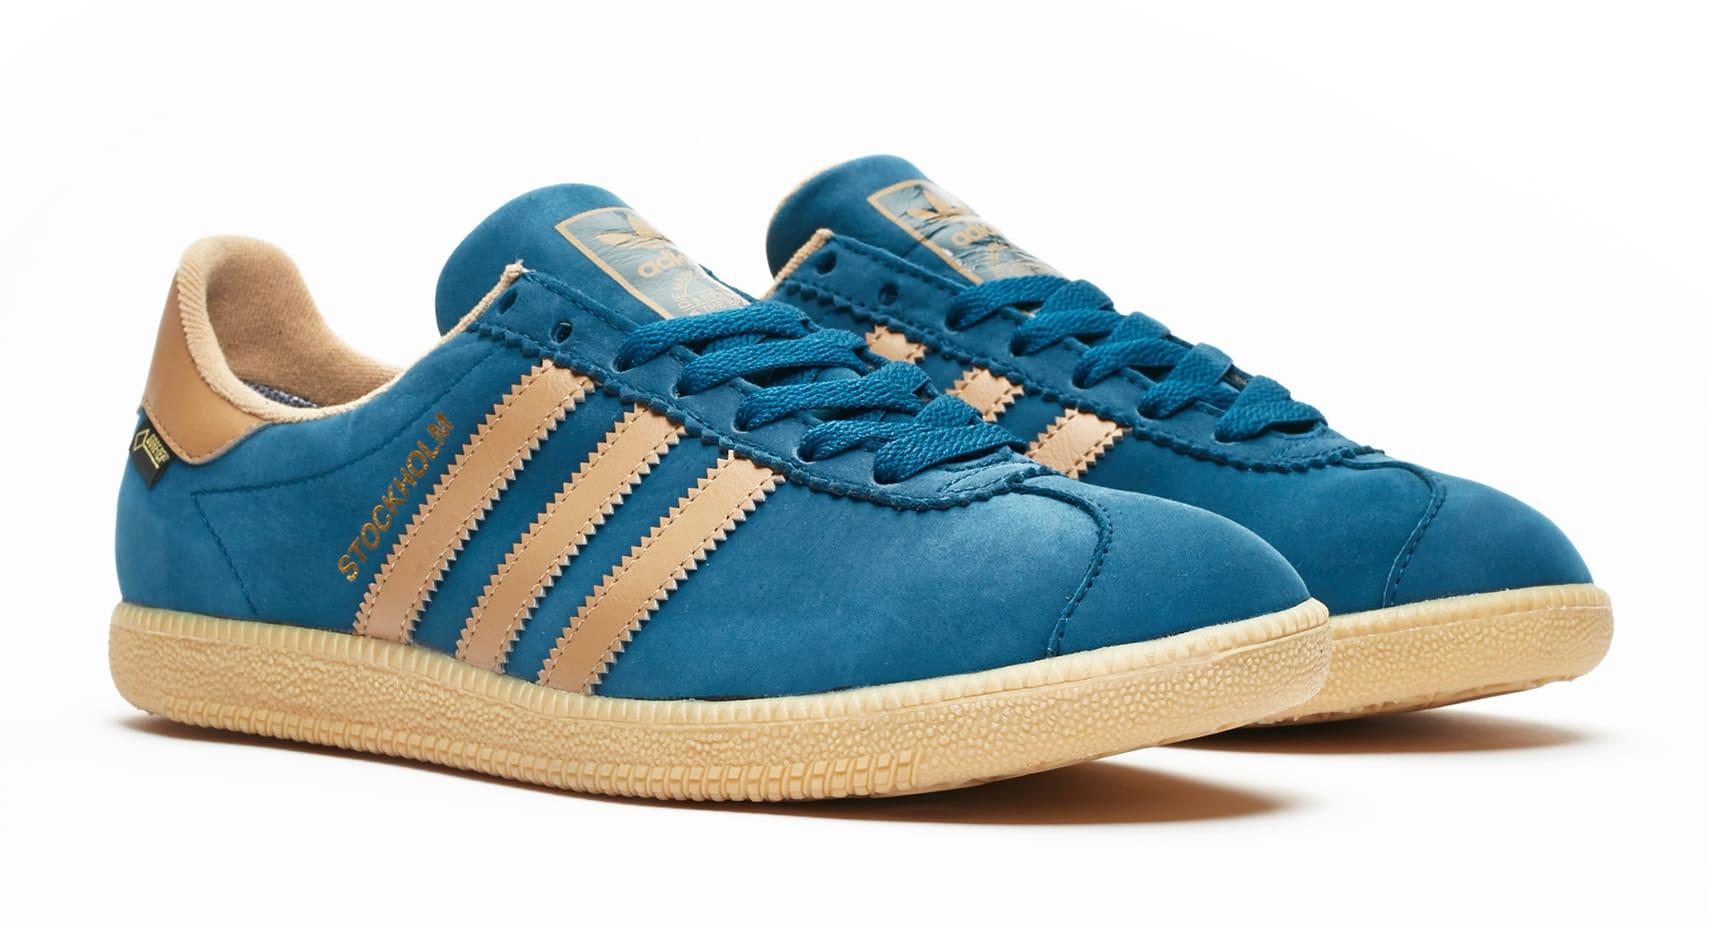 Sneakersnstuff x Adidas Stockholm GTX AC7753 (Pair)